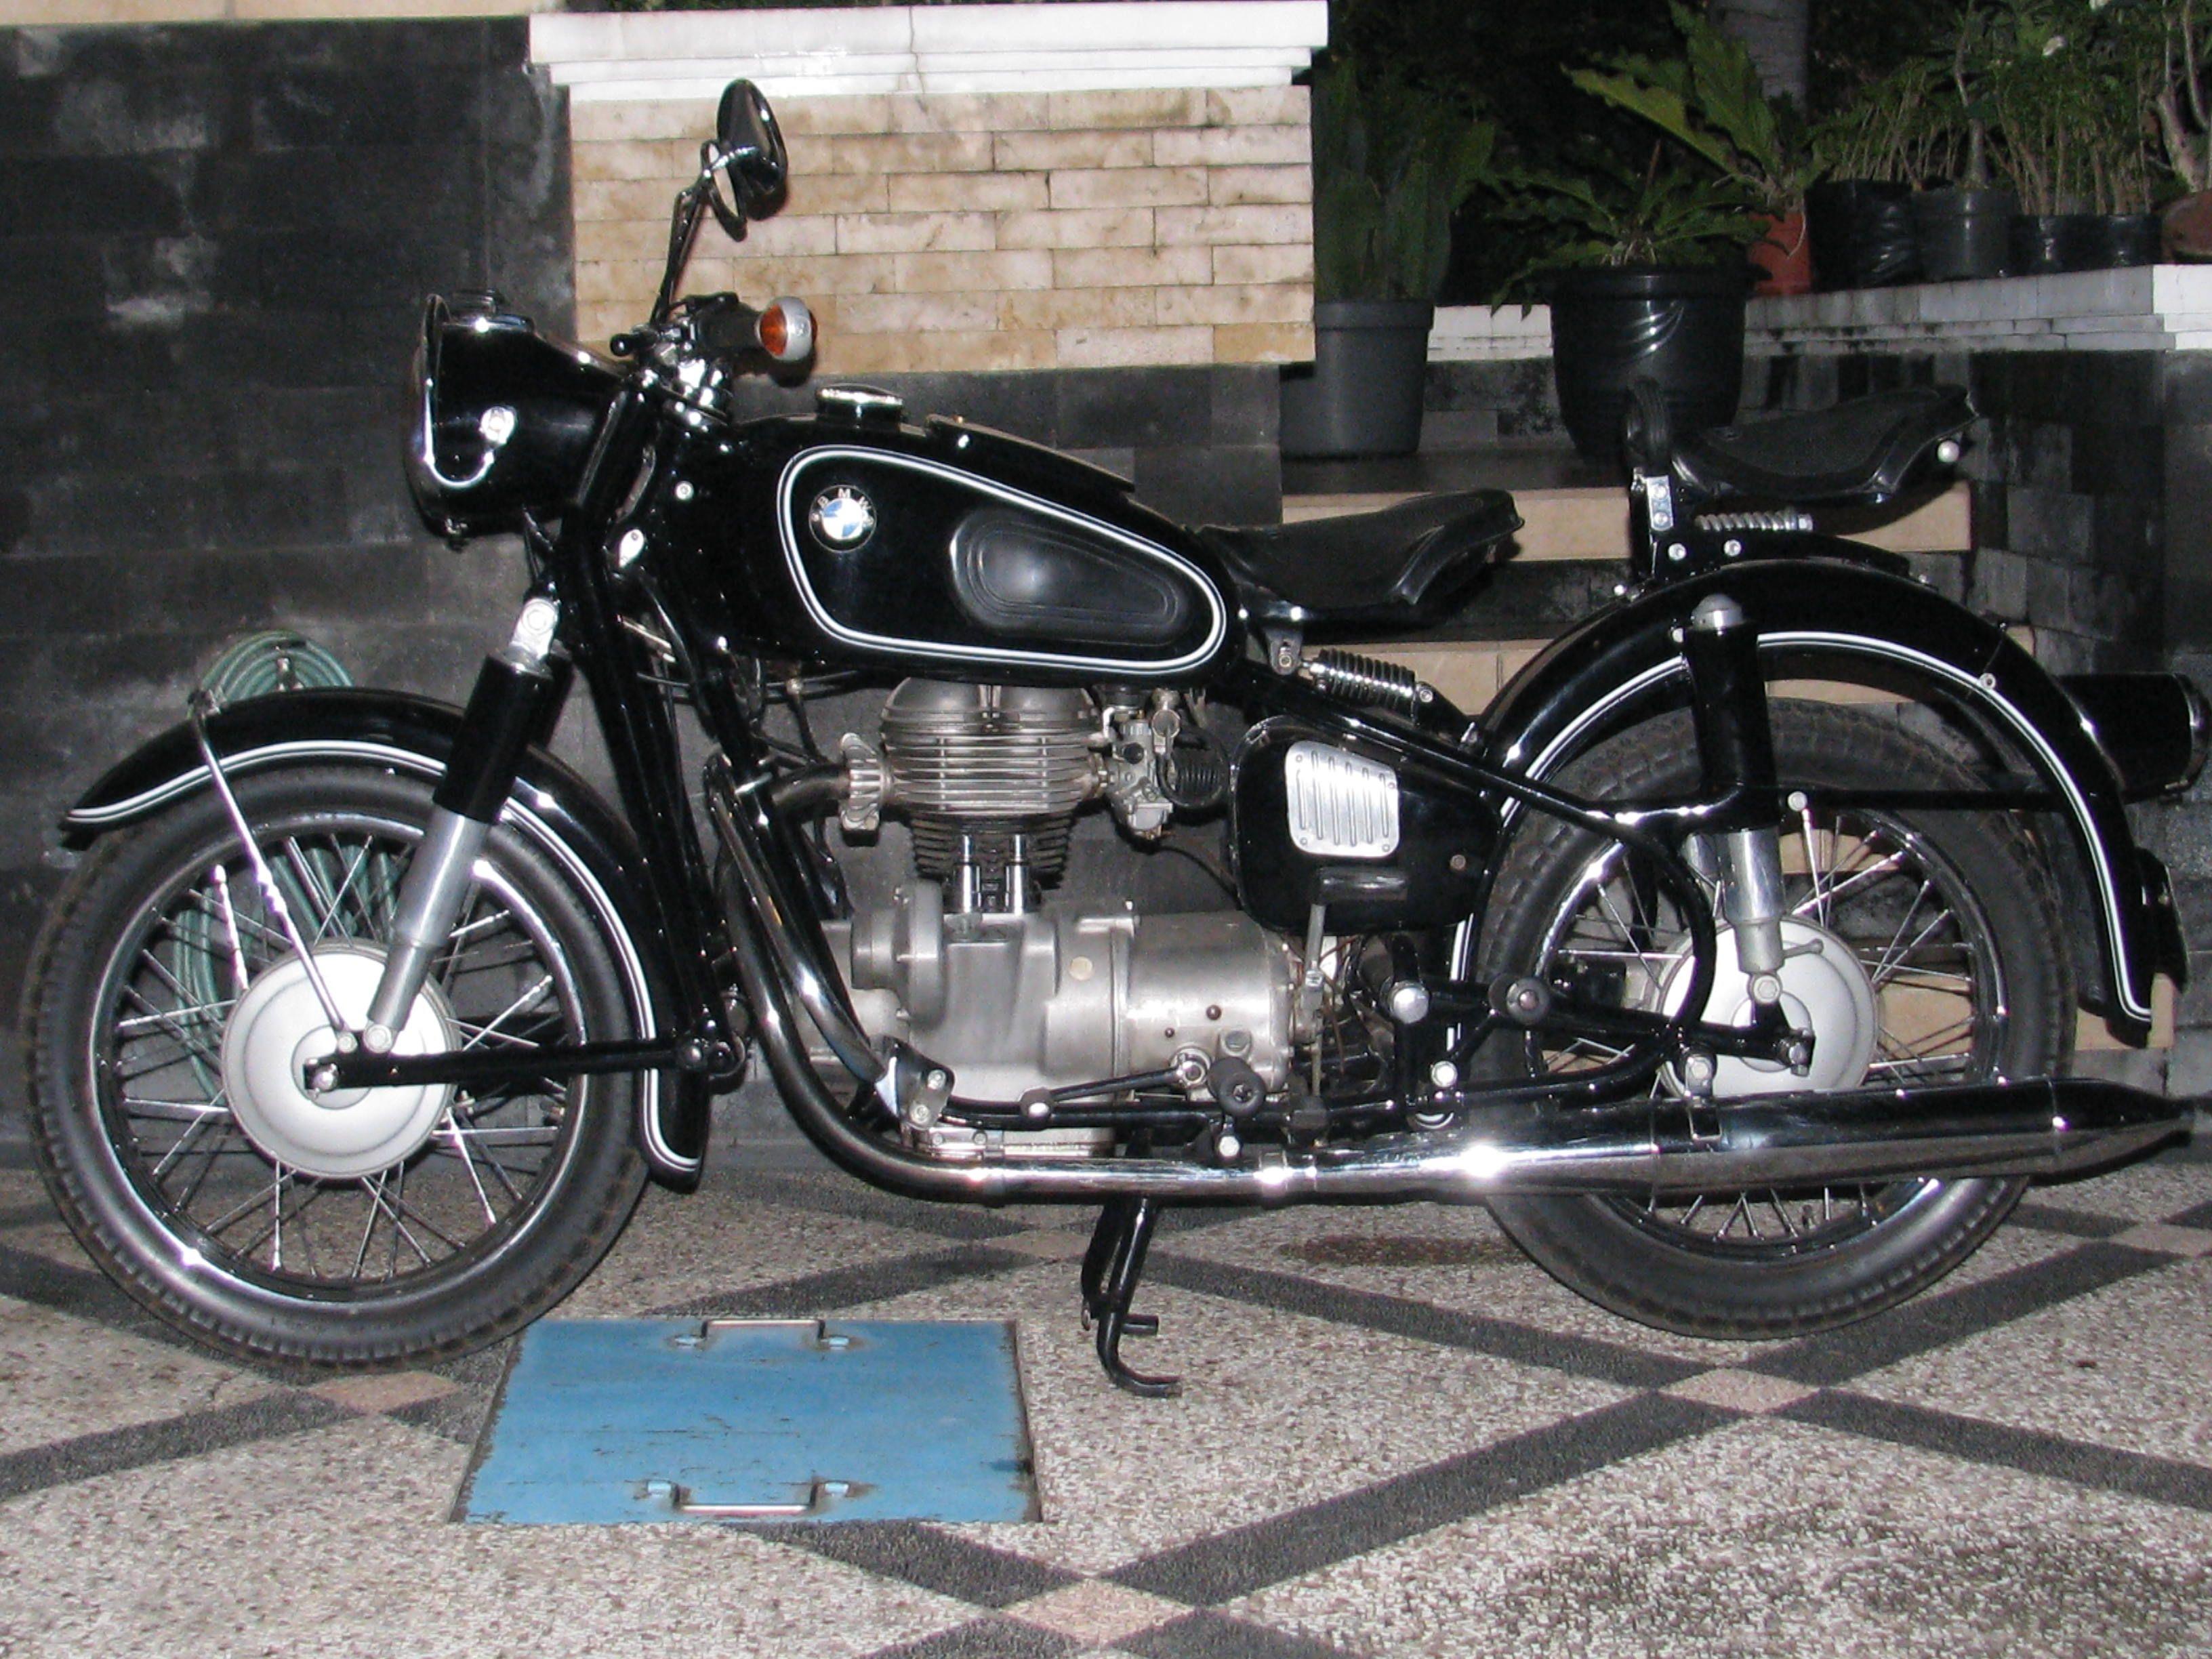 R27 Bmw Vintage Bike With Images Bmw Motorcycles Bmw Vintage Bmw